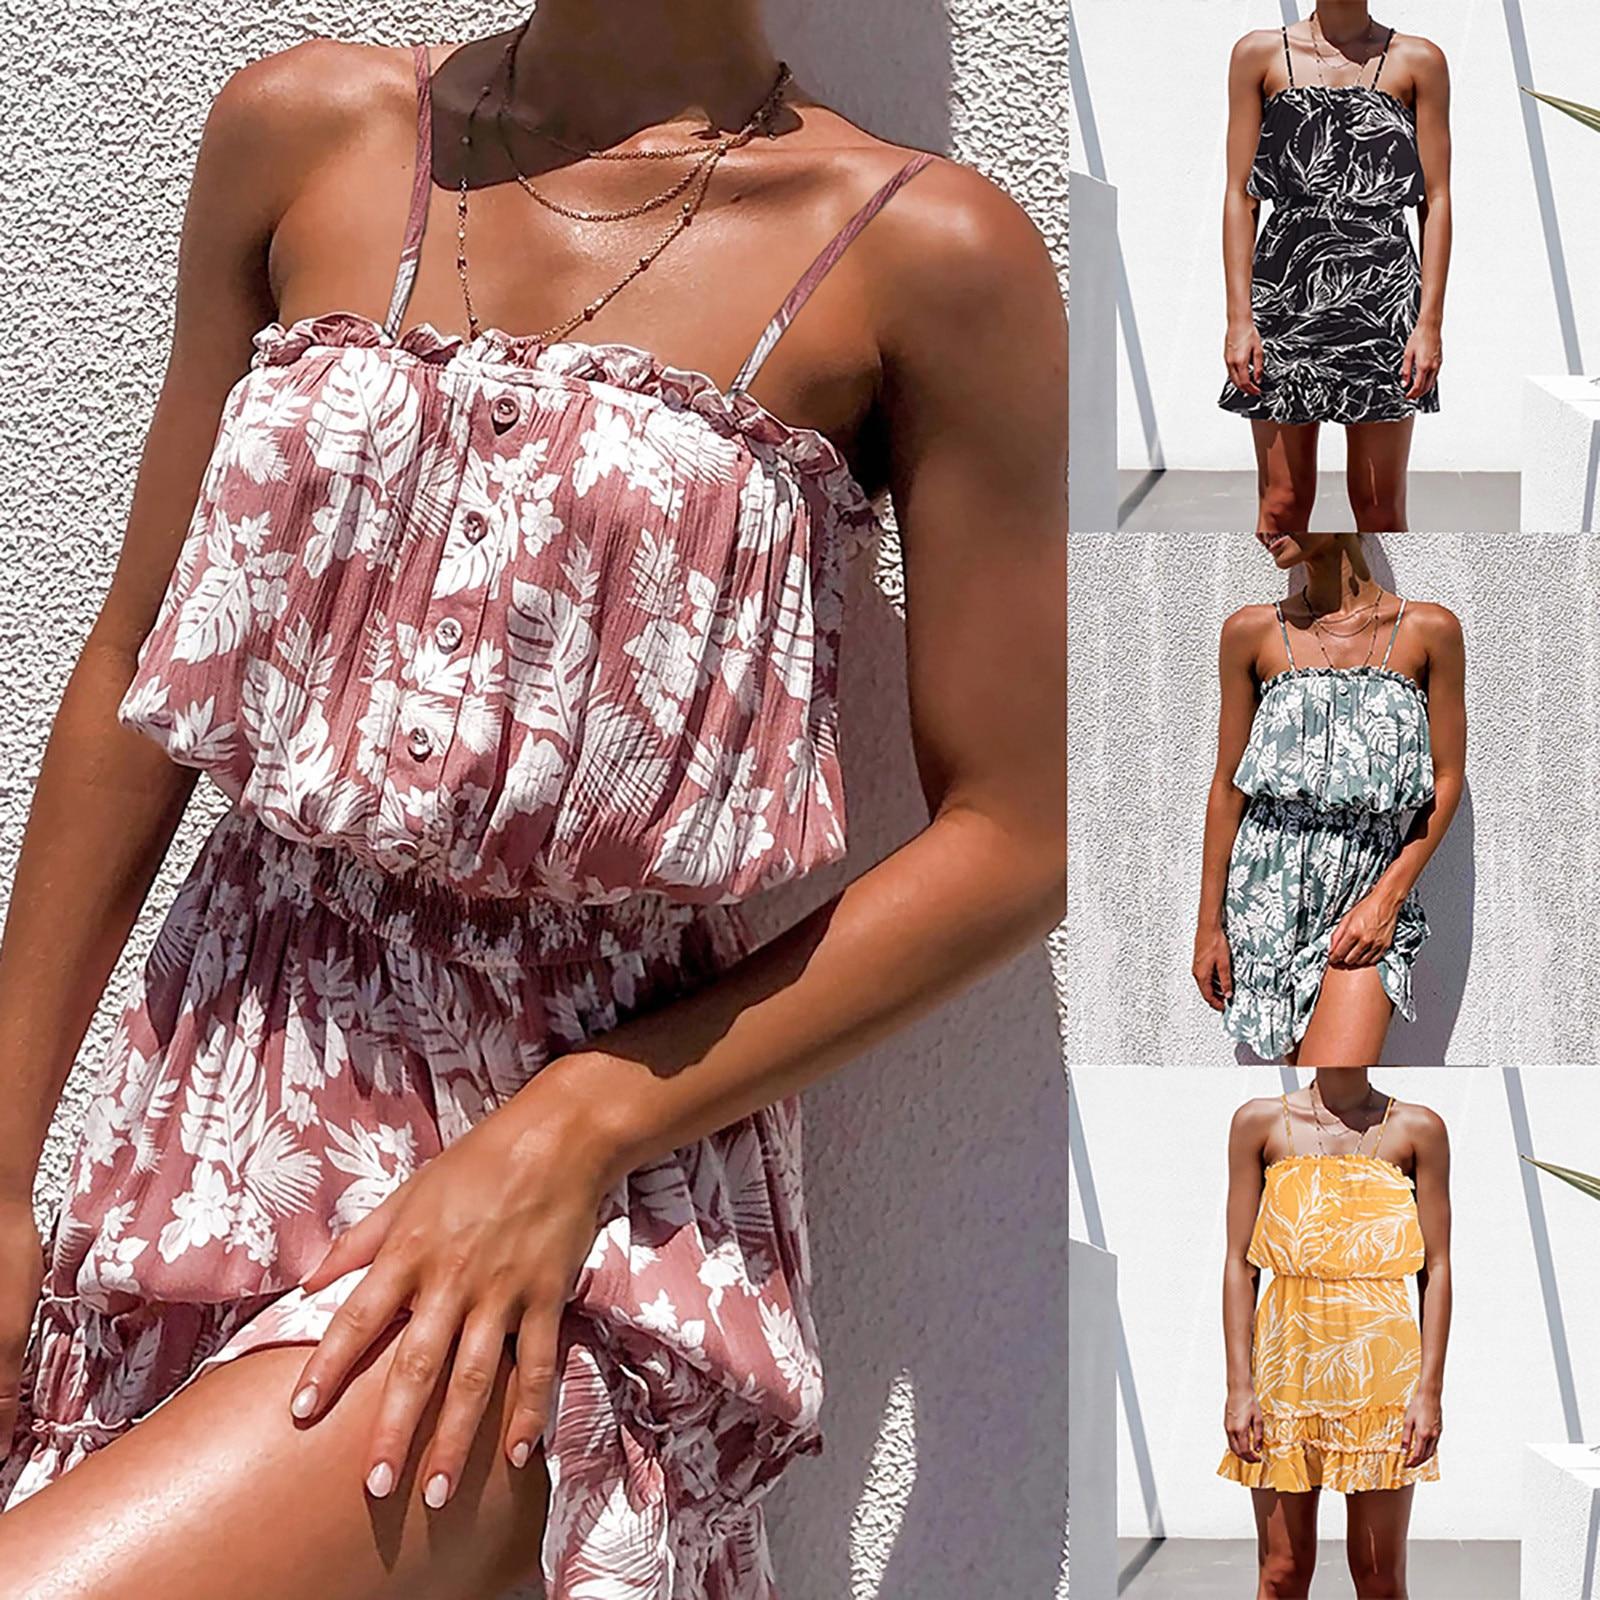 Women Fashion Print Strapless Sleeveless Summer Dress Casual Sexy Slim Floral Dress платье 2021 женское платье vestido de mujer фото